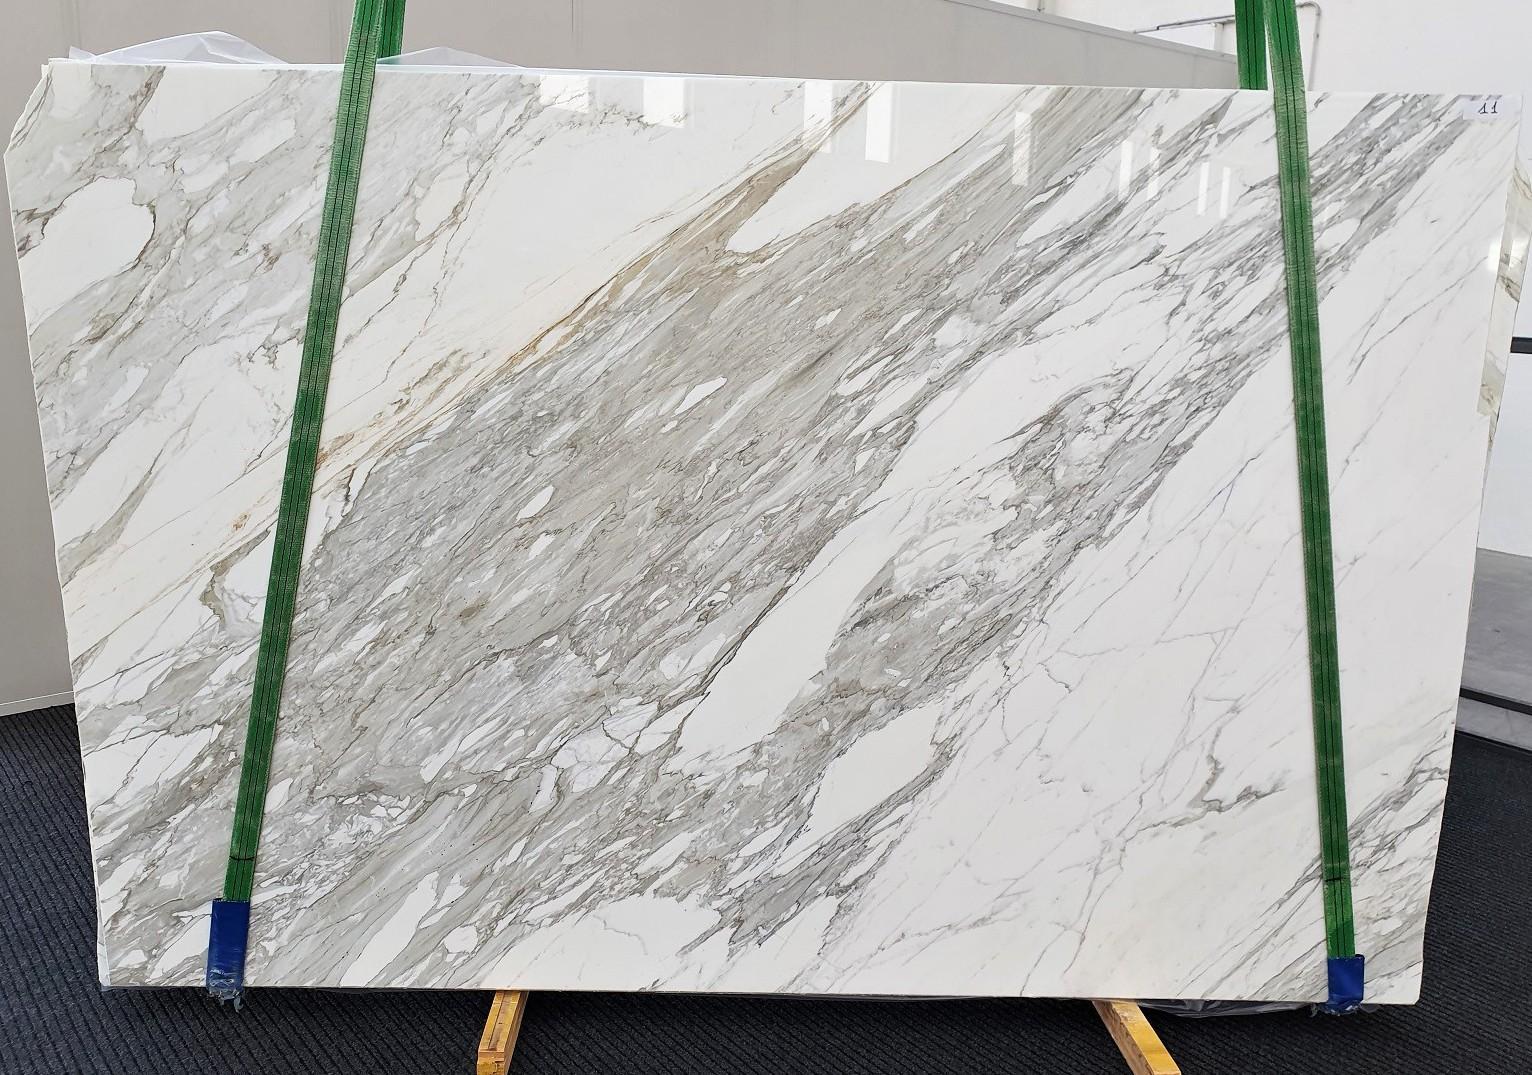 CALACATTA Supply Veneto (Italy) polished slabs 1344 , B - slab #11 natural marble